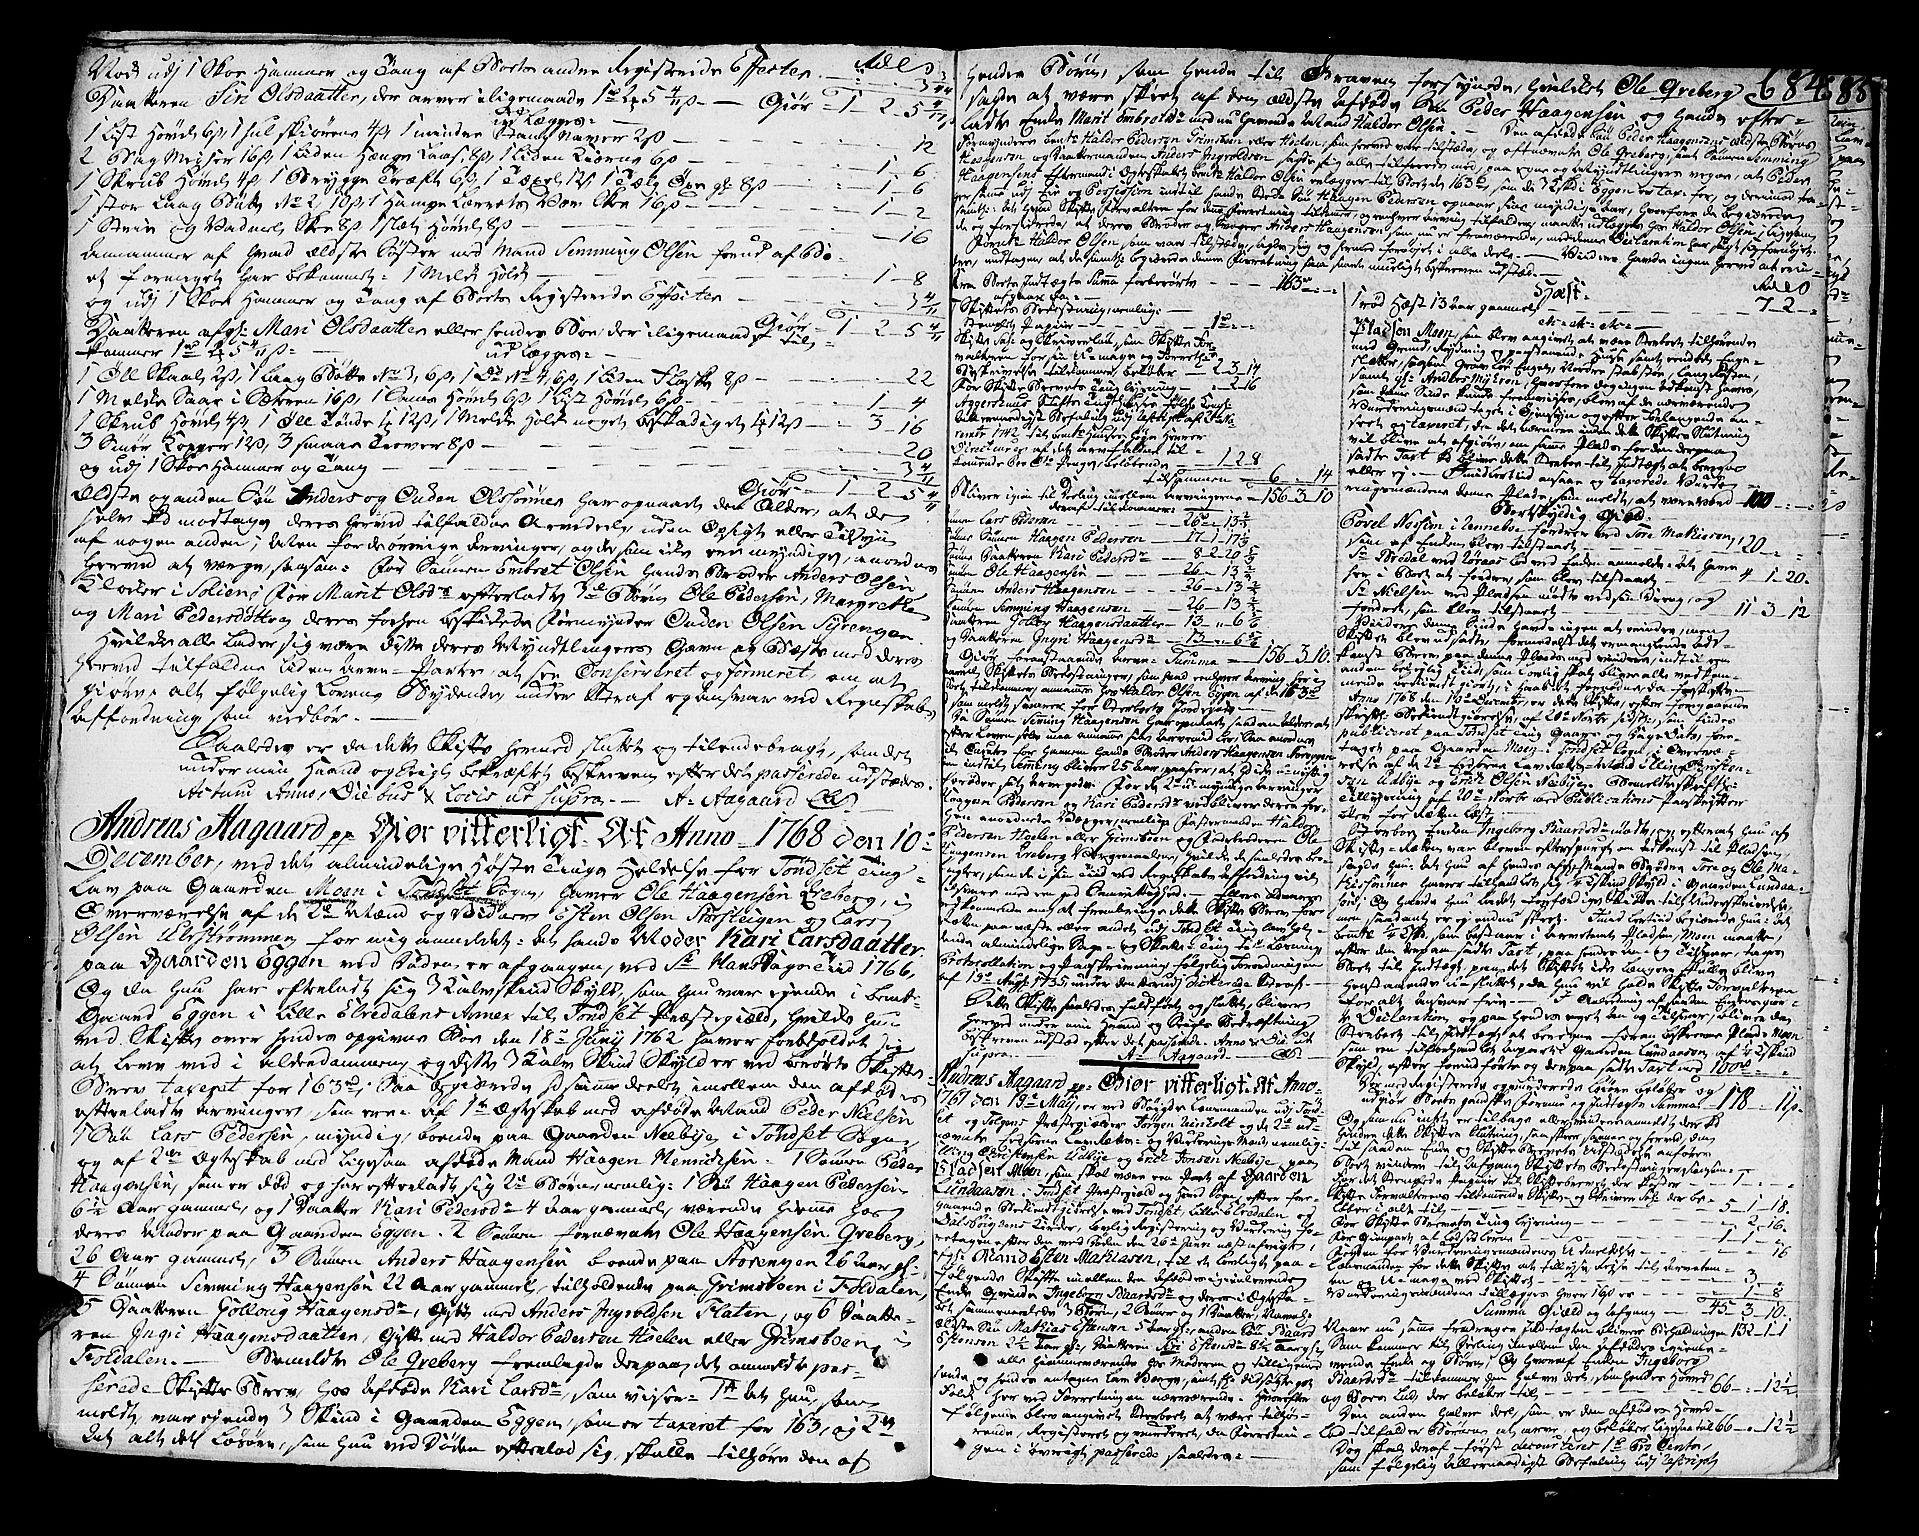 SAH, Solør og Østerdalen sorenskriveri, J/Ja/L0013: Skifteprotokoll, 1764-1768, s. 683b-684a